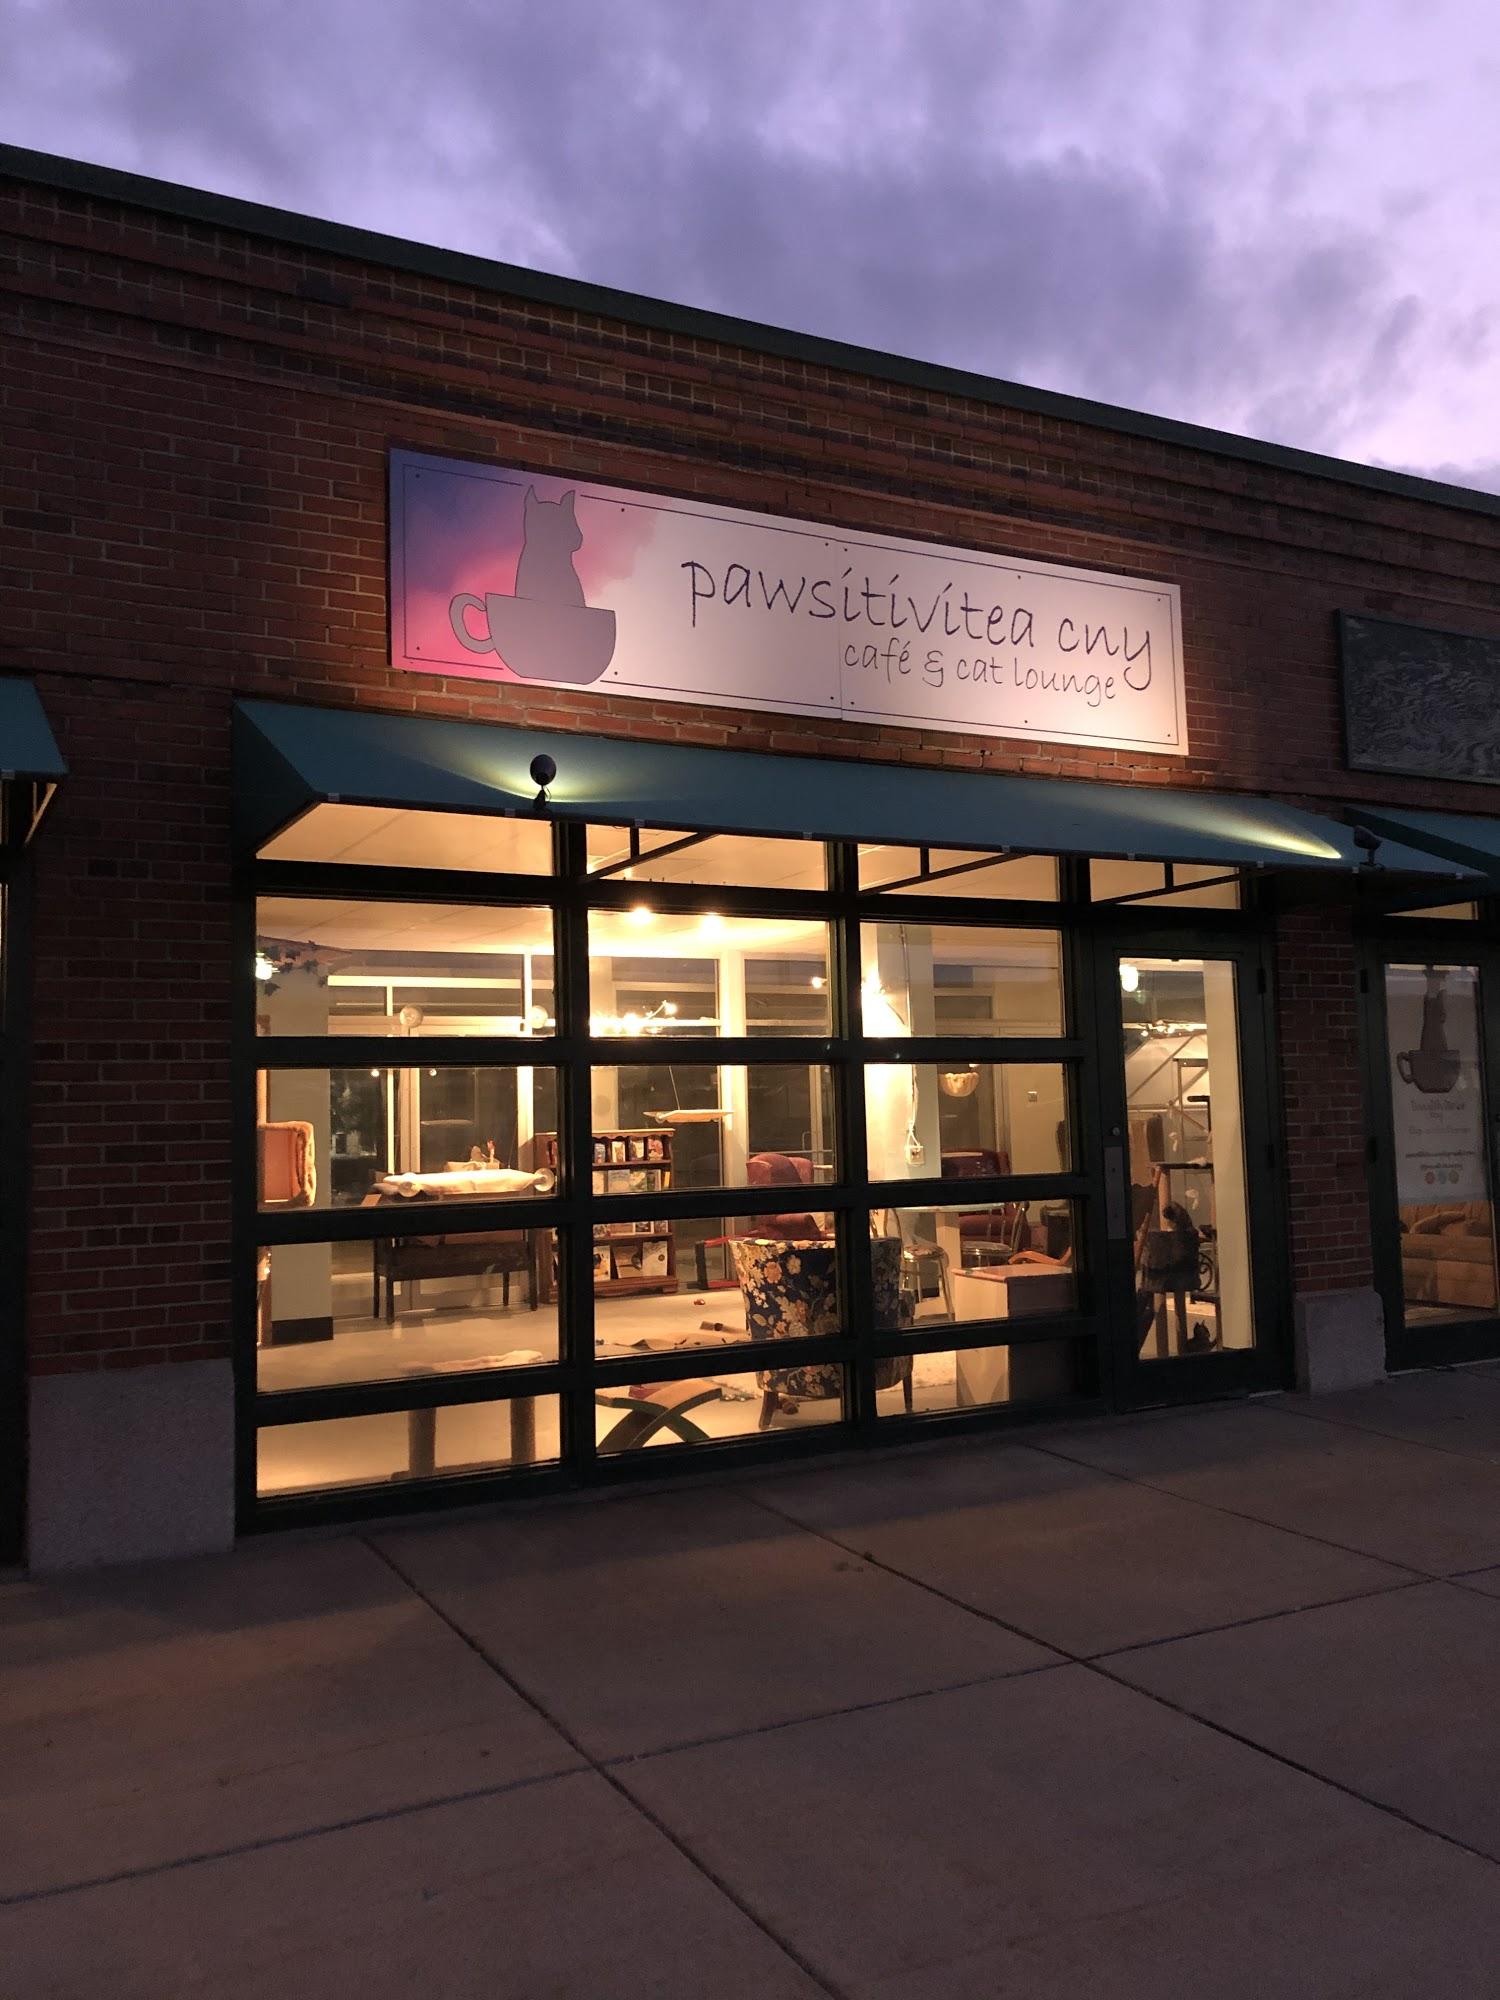 Pawsitivitea CNY Cafe & Cat Lounge 2100 Park St, Syracuse